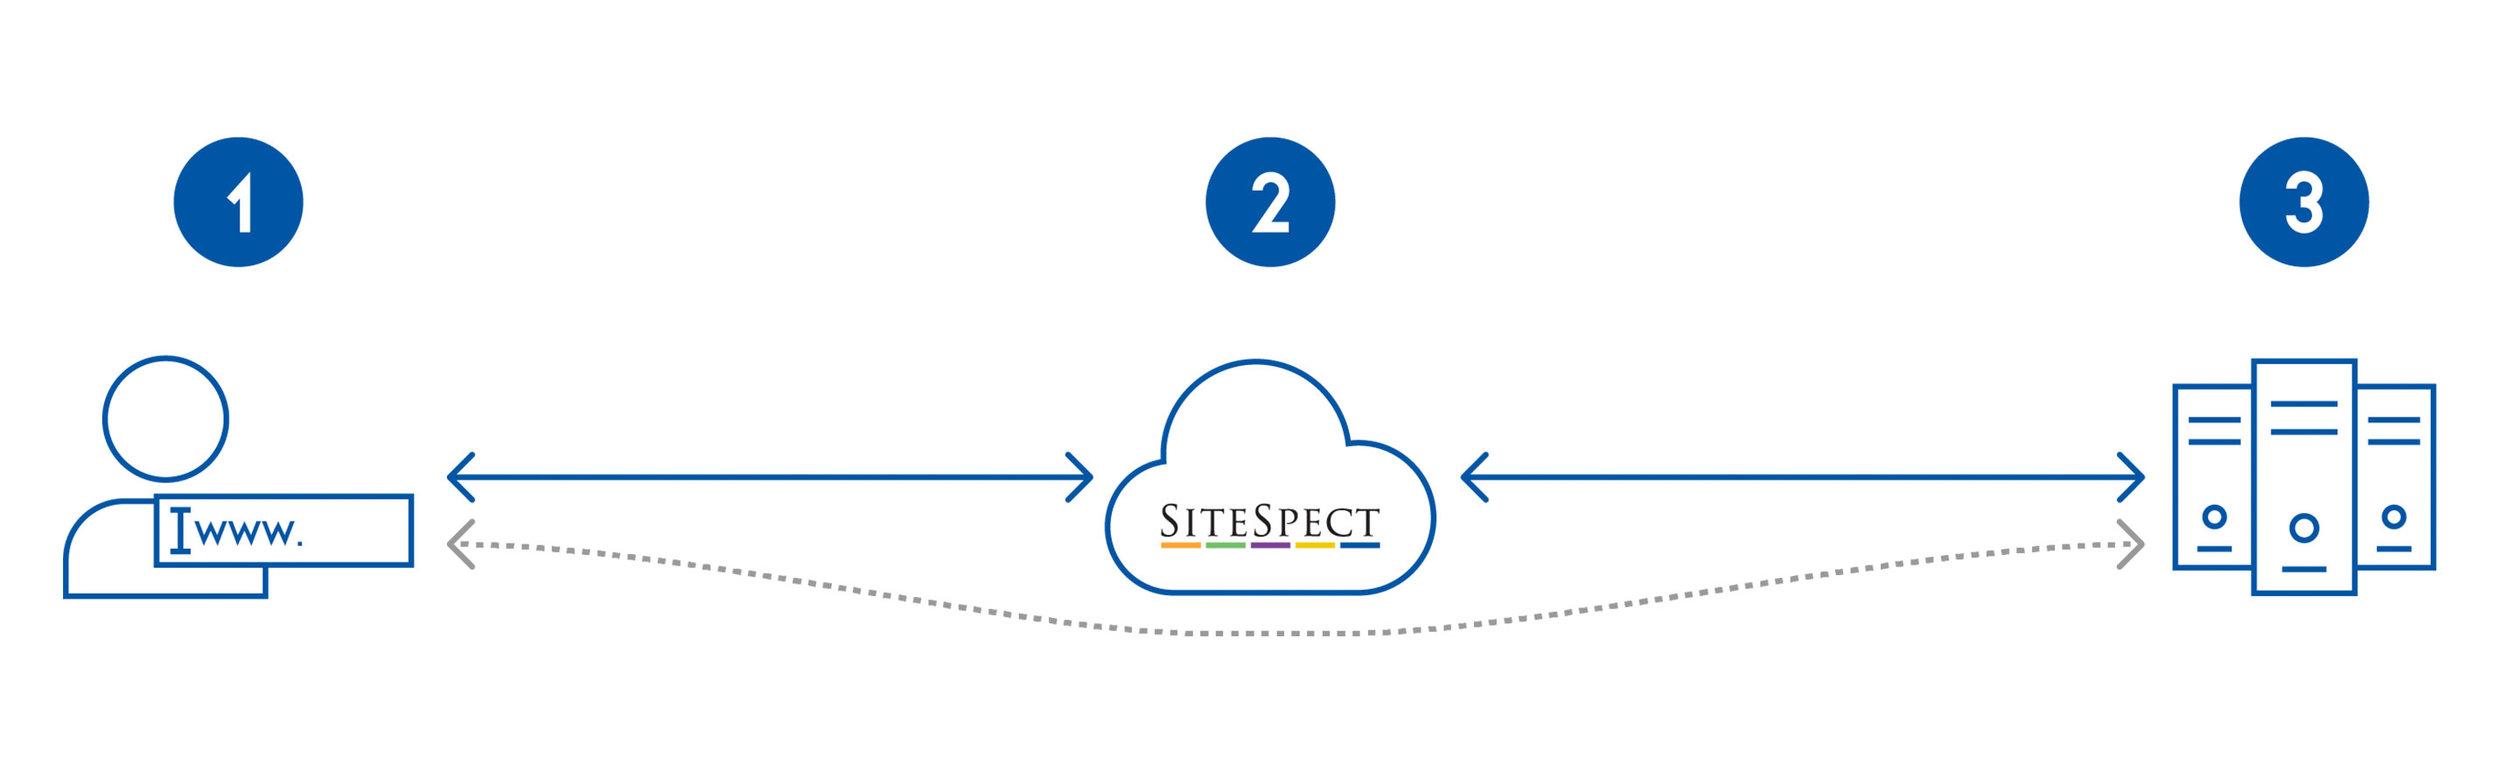 Studio-Eighty-Seven-SiteSpect-Marketing-Support-Sales-Presentation-Graphic.jpg